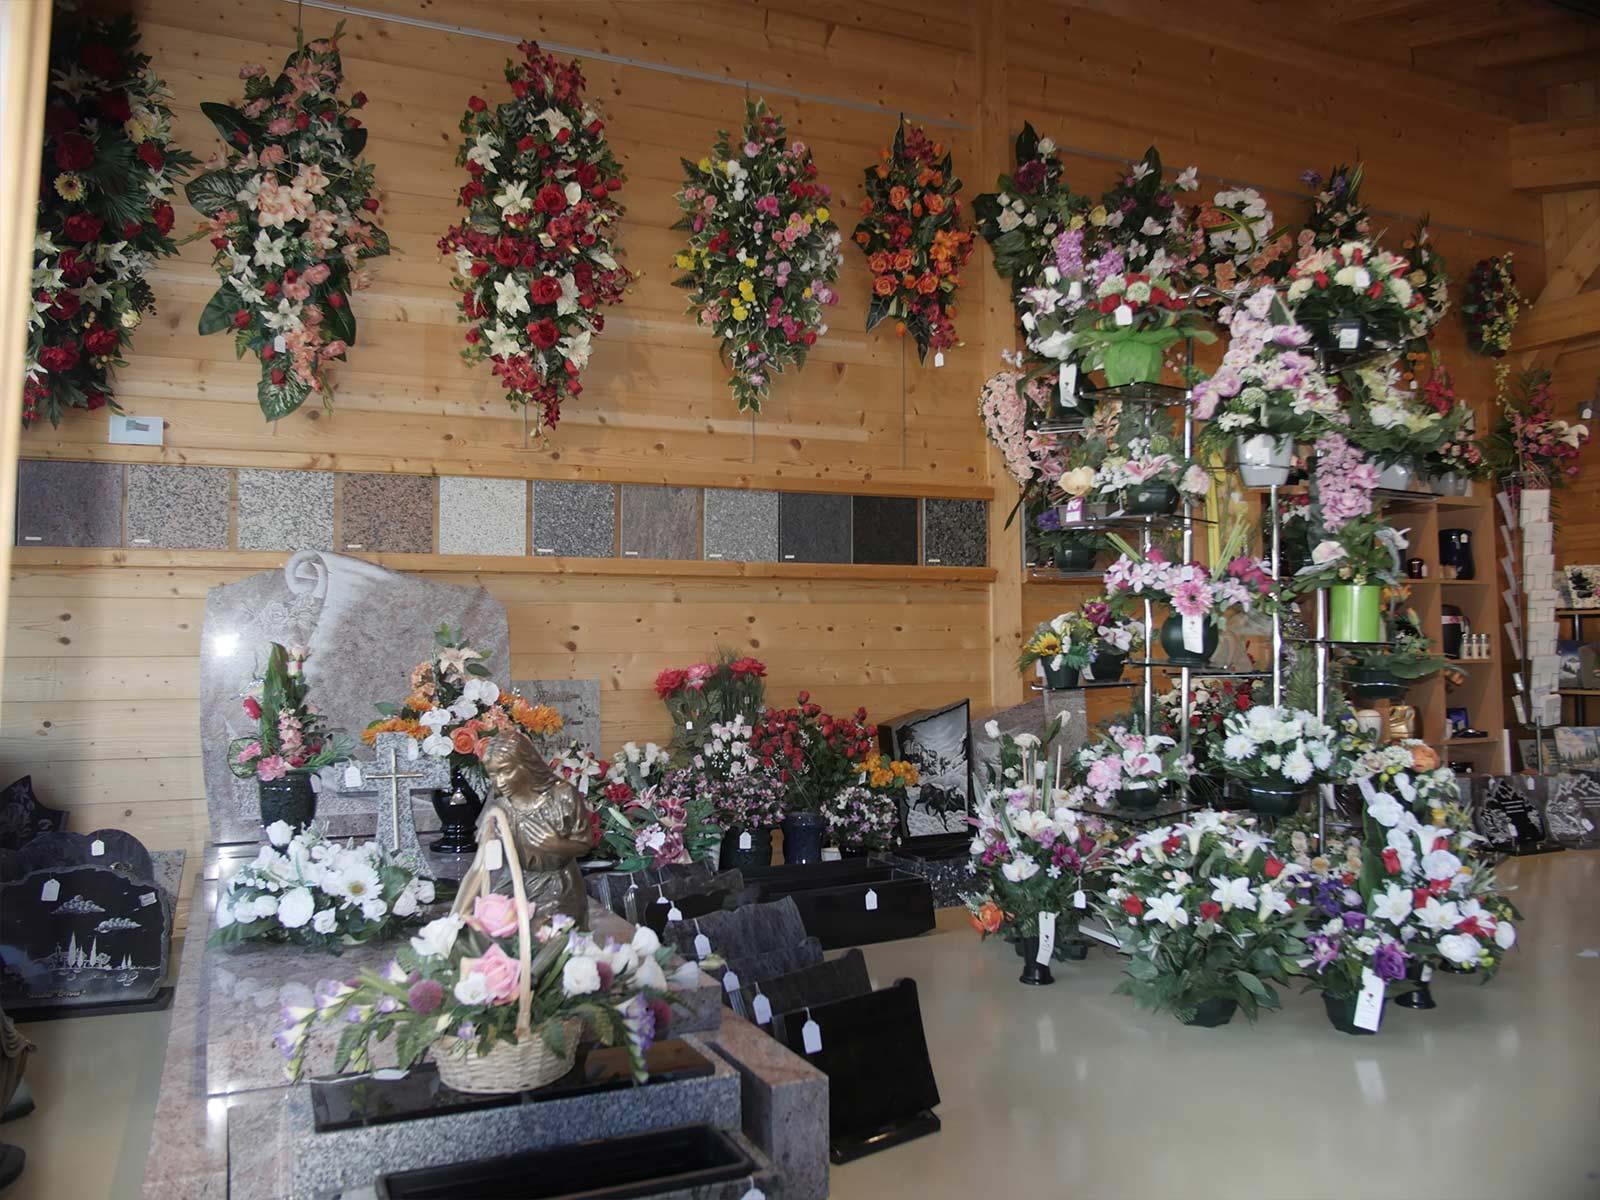 l'organisation des obsèques à Ugine | Marbrerie Pech